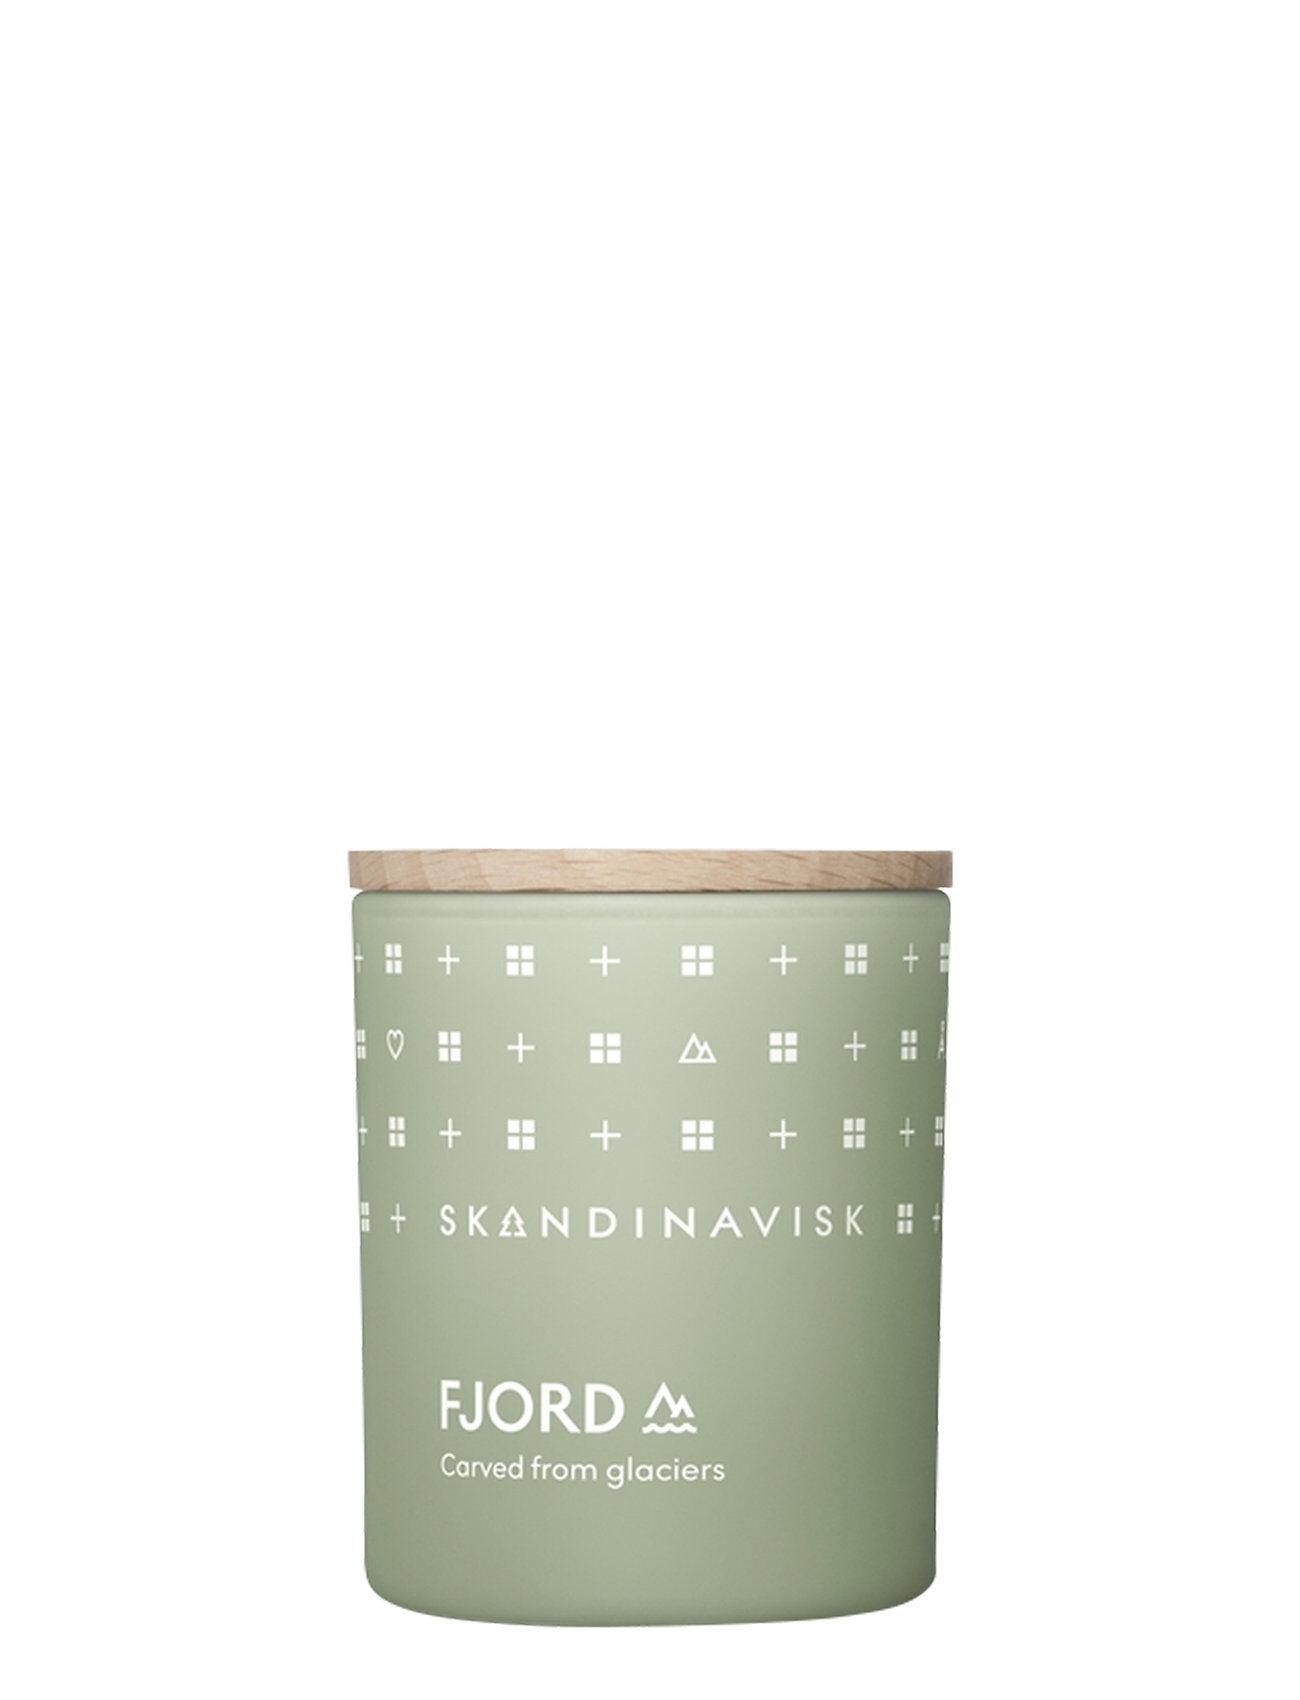 Skandinavisk Fjord Scented Candle With Lid 65g Tuoksukynttilä Nude Skandinavisk